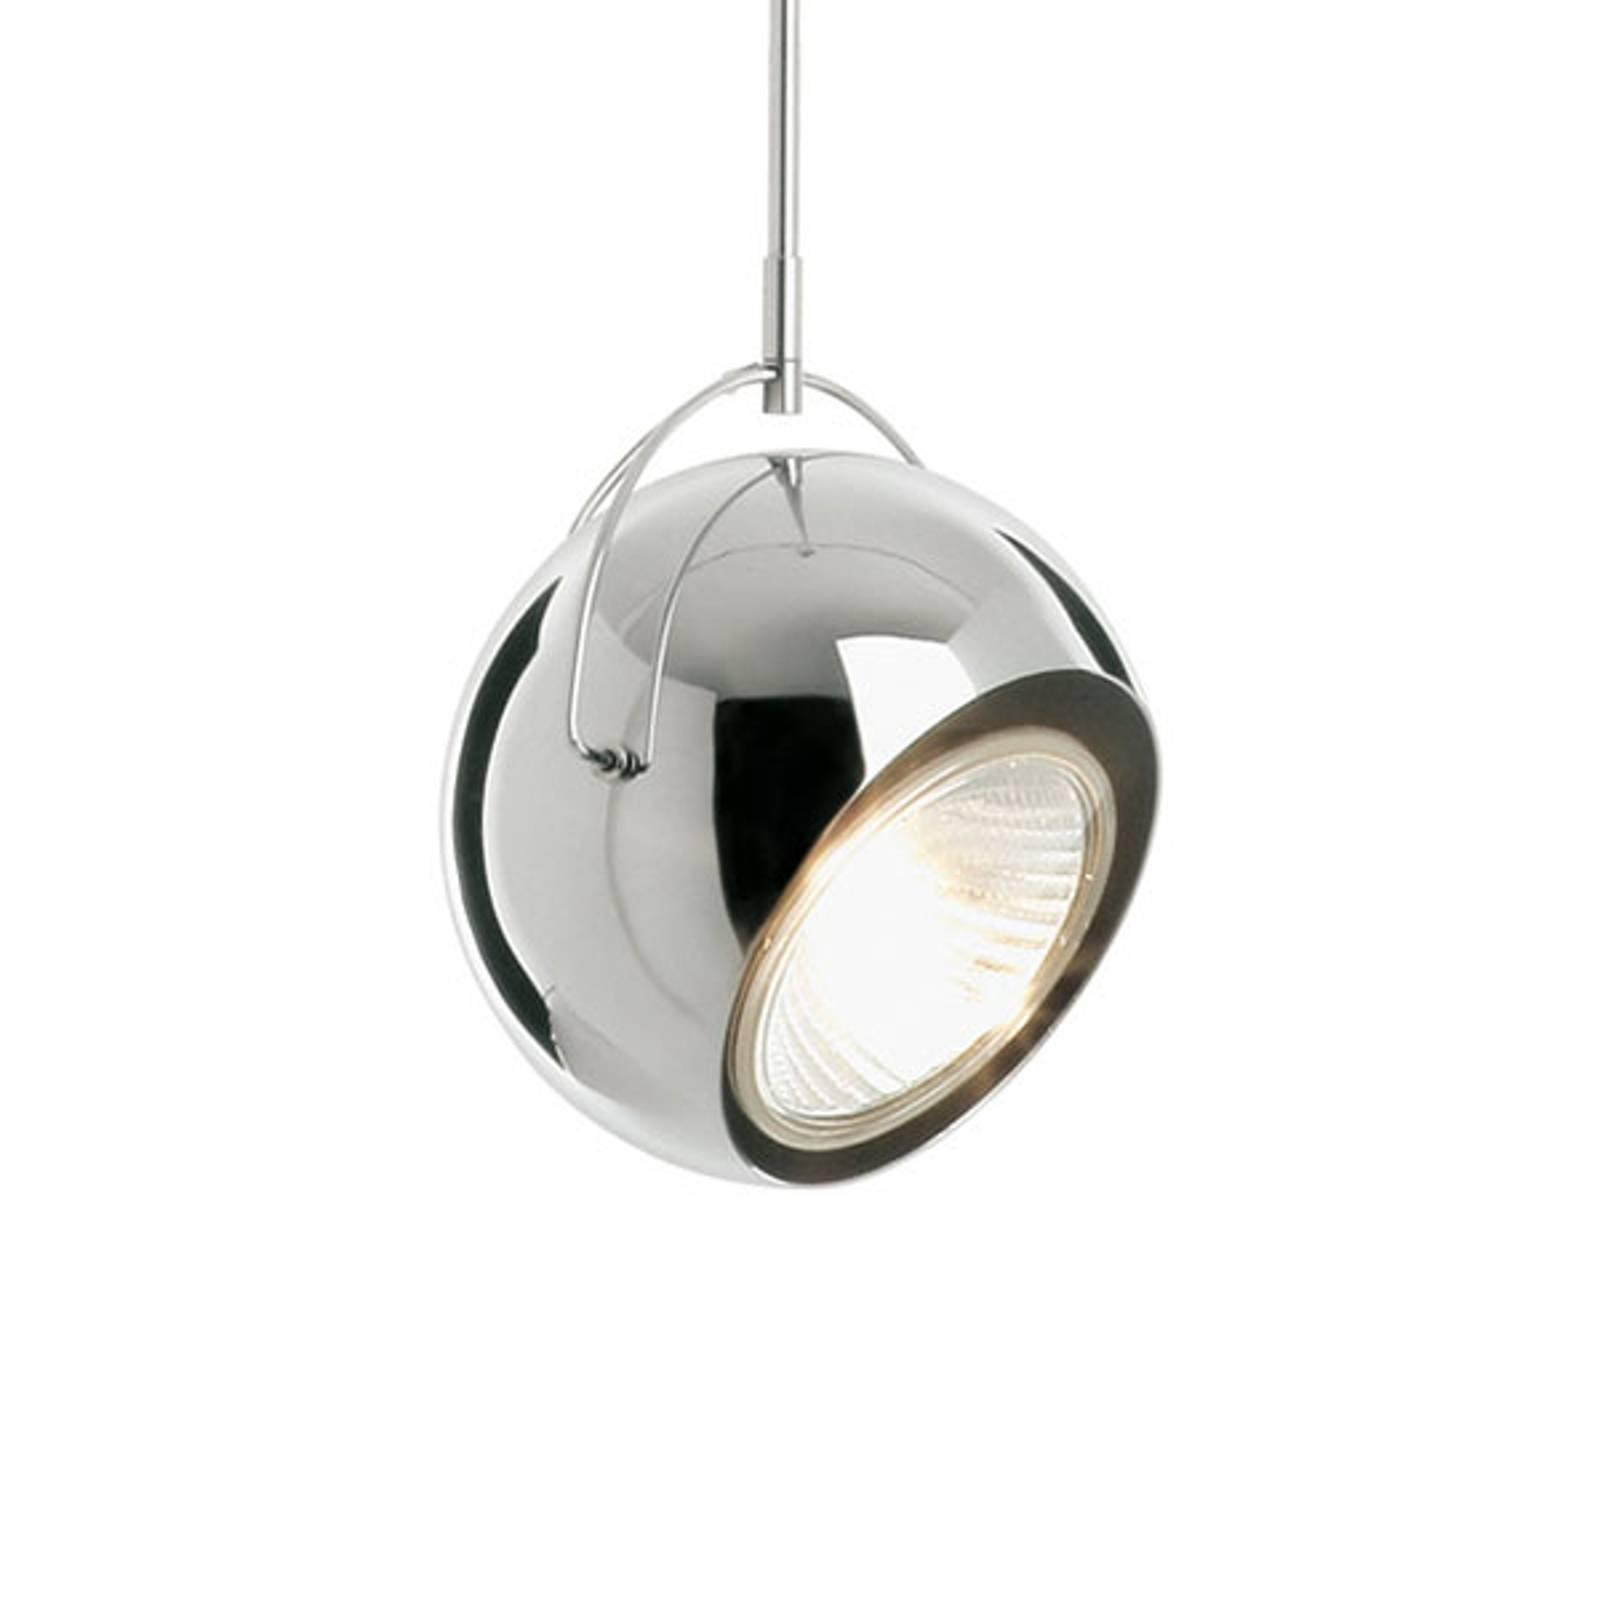 Fabbian Beluga staal chroom-hanglamp, Ø 14 cm